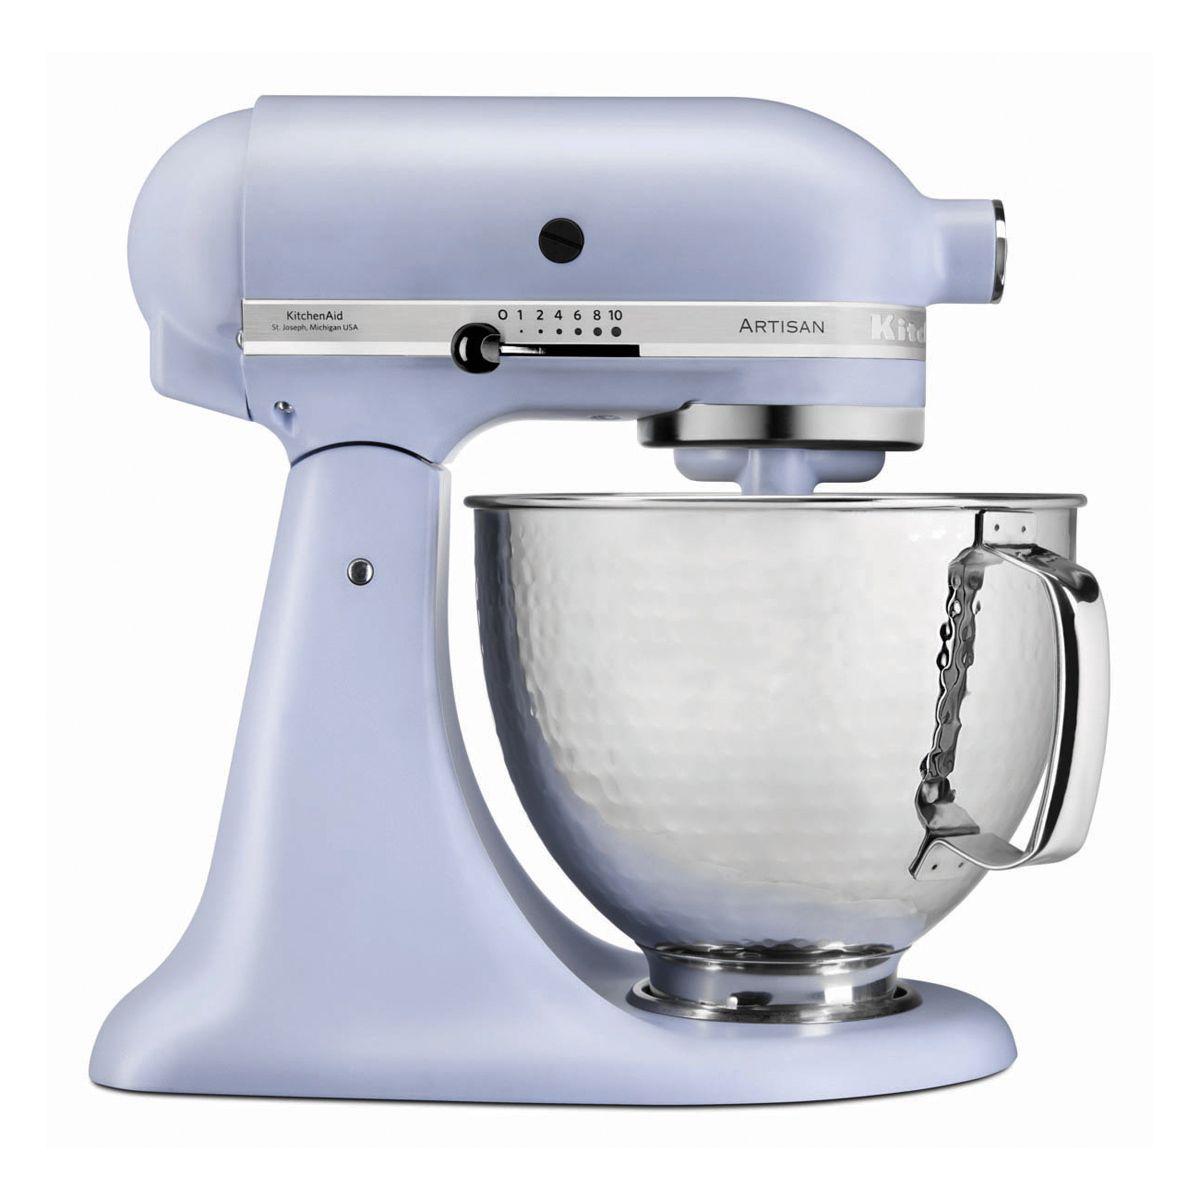 Kitchenaid Artisan 4 8l Stand Mixer Limited Edition Matte Lavender Jarrold Norwich In 2020 Kitchenaid Artisan Stand Mixer Artisan Mixer Kitchenaid Artisan